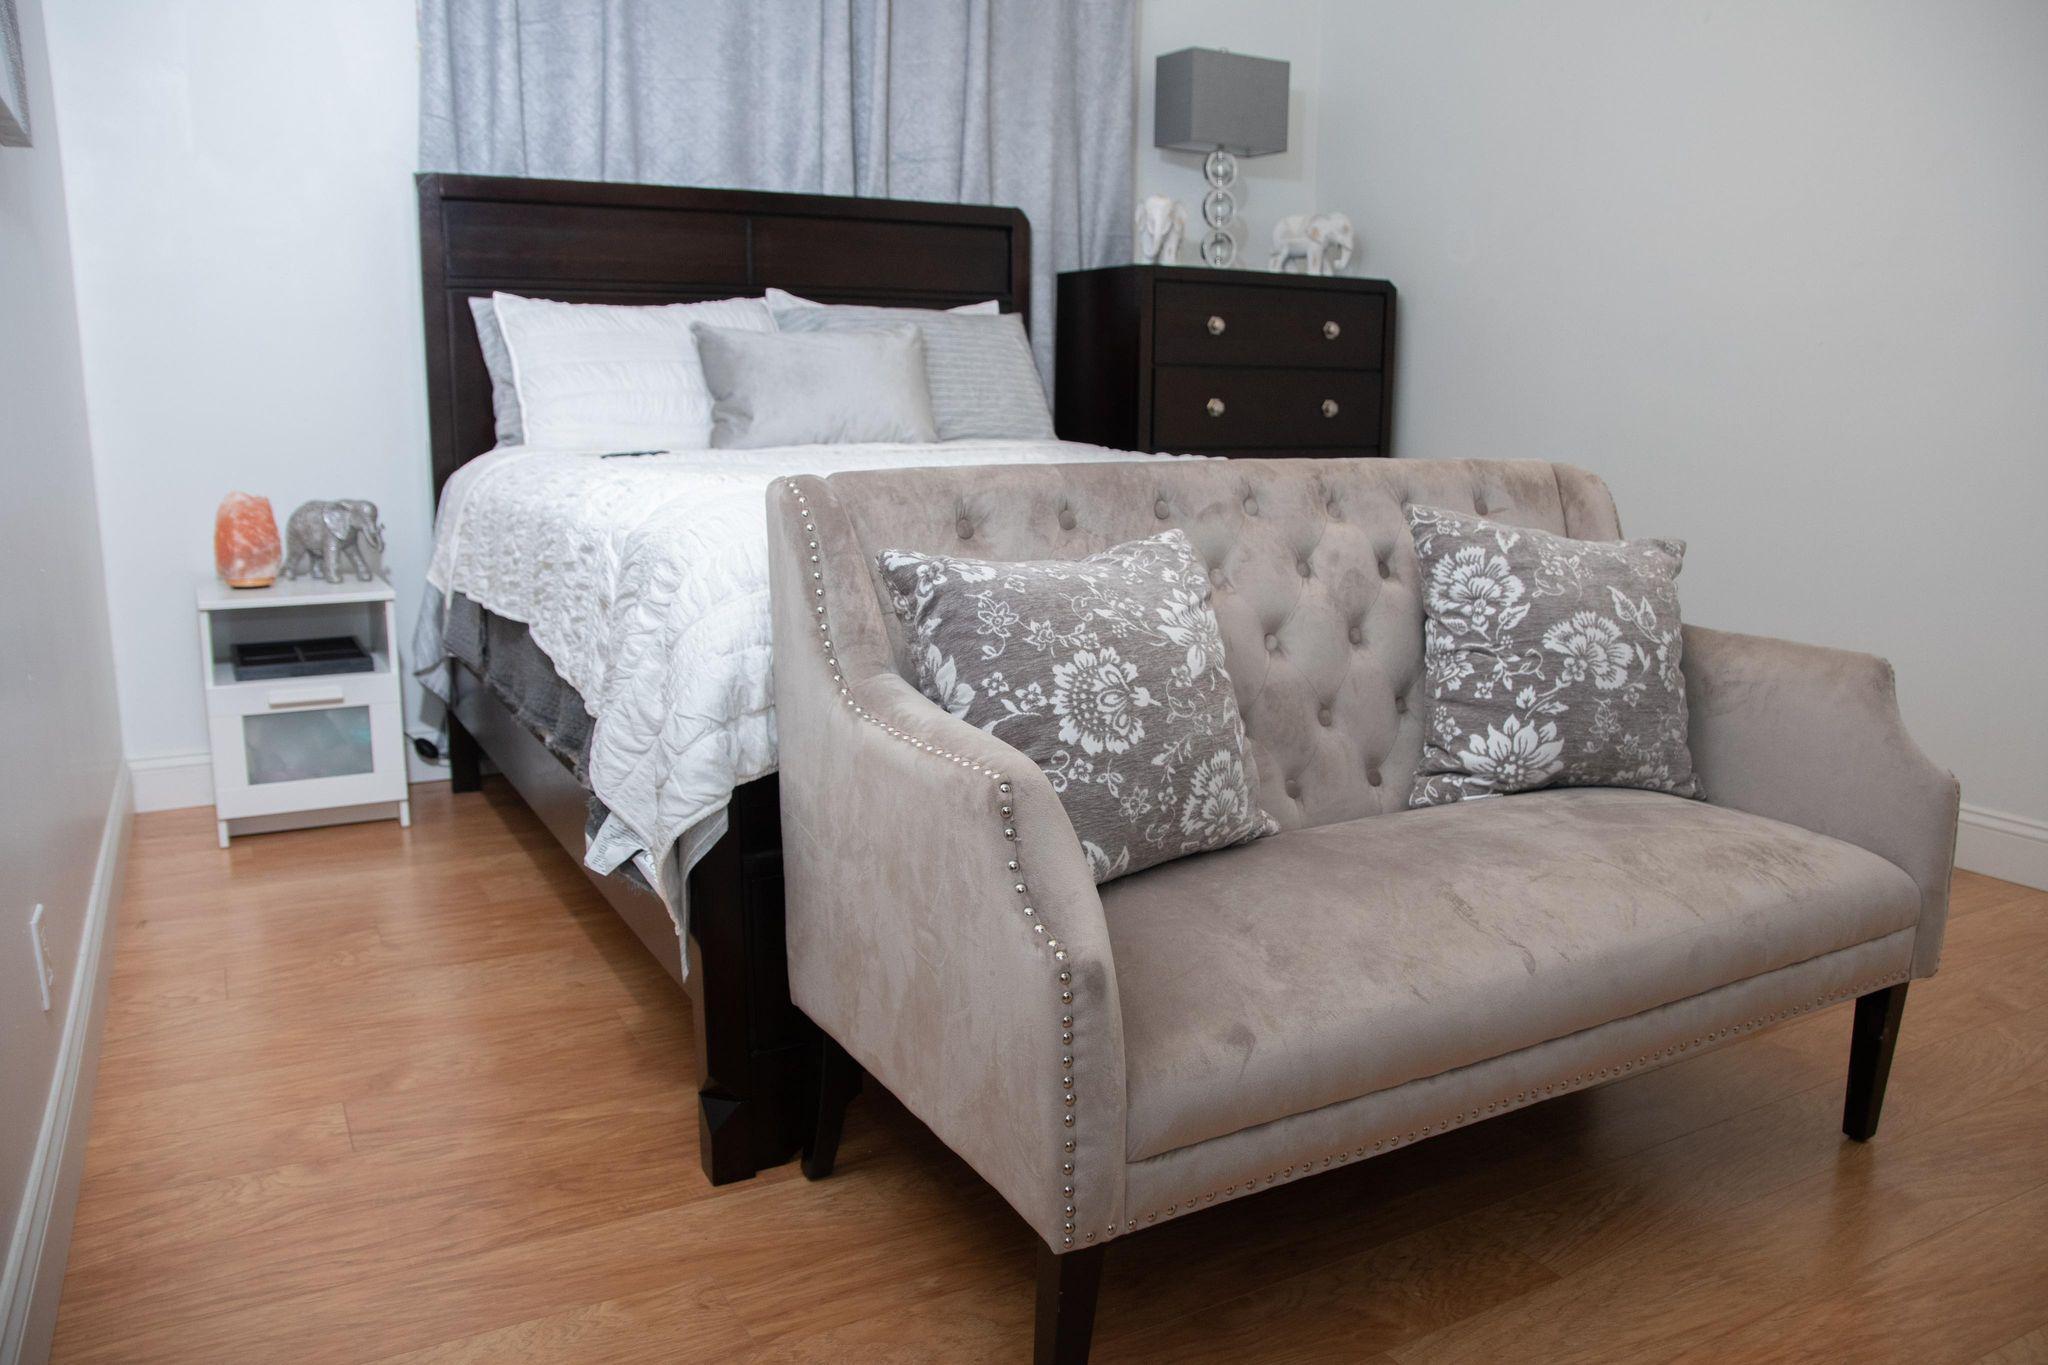 8937 23rd Street, Coral Springs, Florida 33065, 2 Bedrooms Bedrooms, ,2 BathroomsBathrooms,Rental,For Rent,23rd,RX-10689021